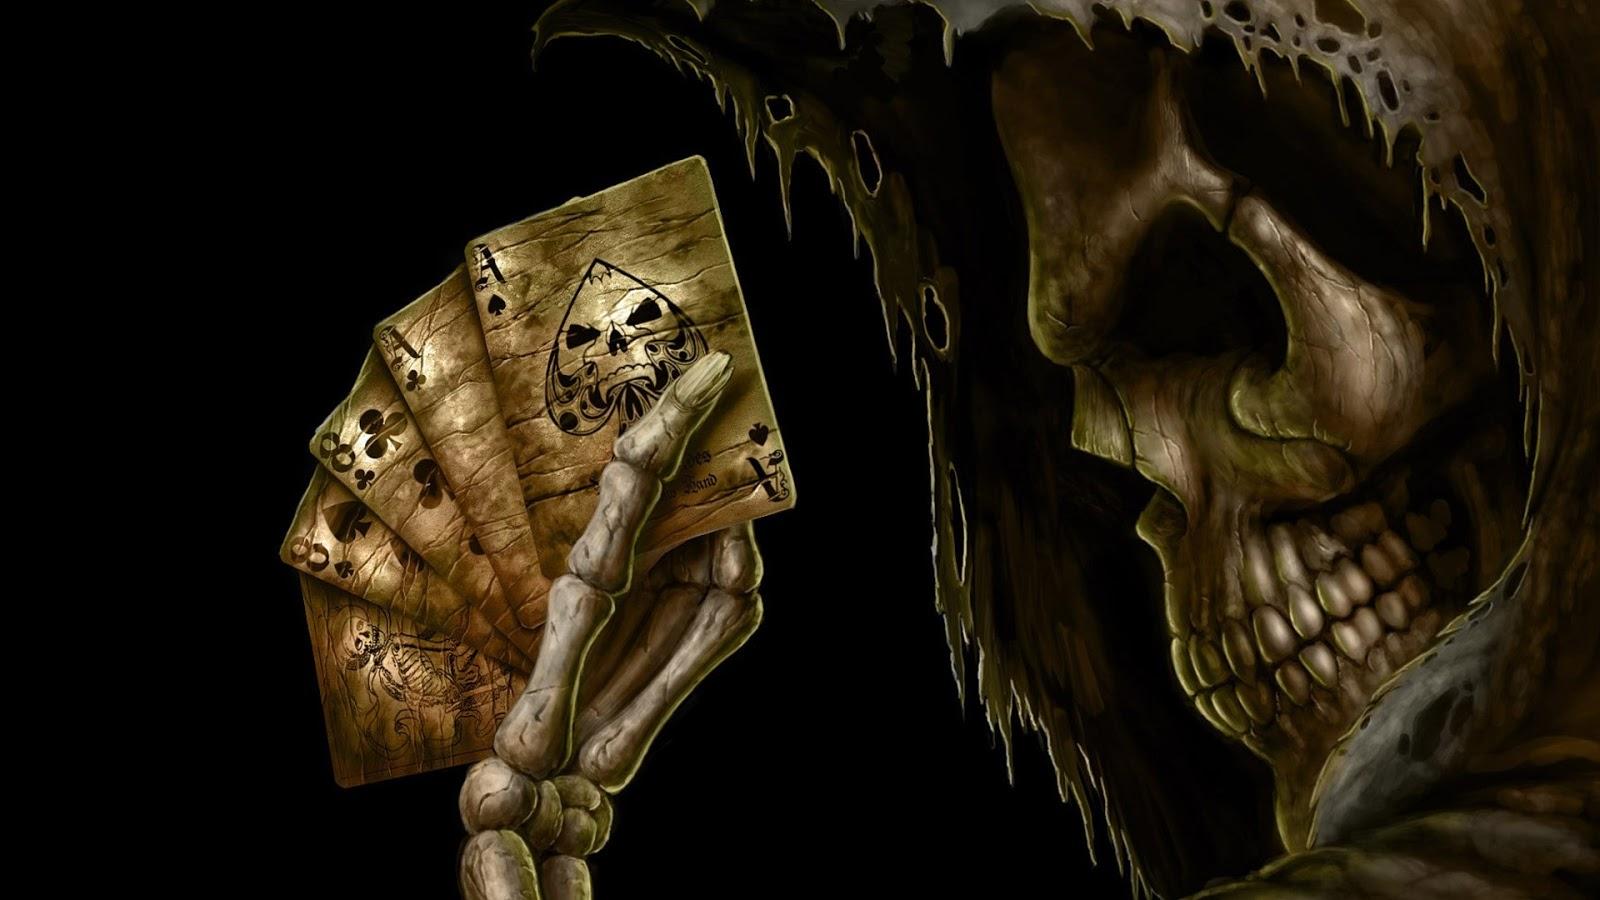 http://4.bp.blogspot.com/-l8yJmuqtJ84/UI-svFy-JAI/AAAAAAAAFuc/uPwhHYOzcm0/s1600/skeleton-playing-poker.jpg